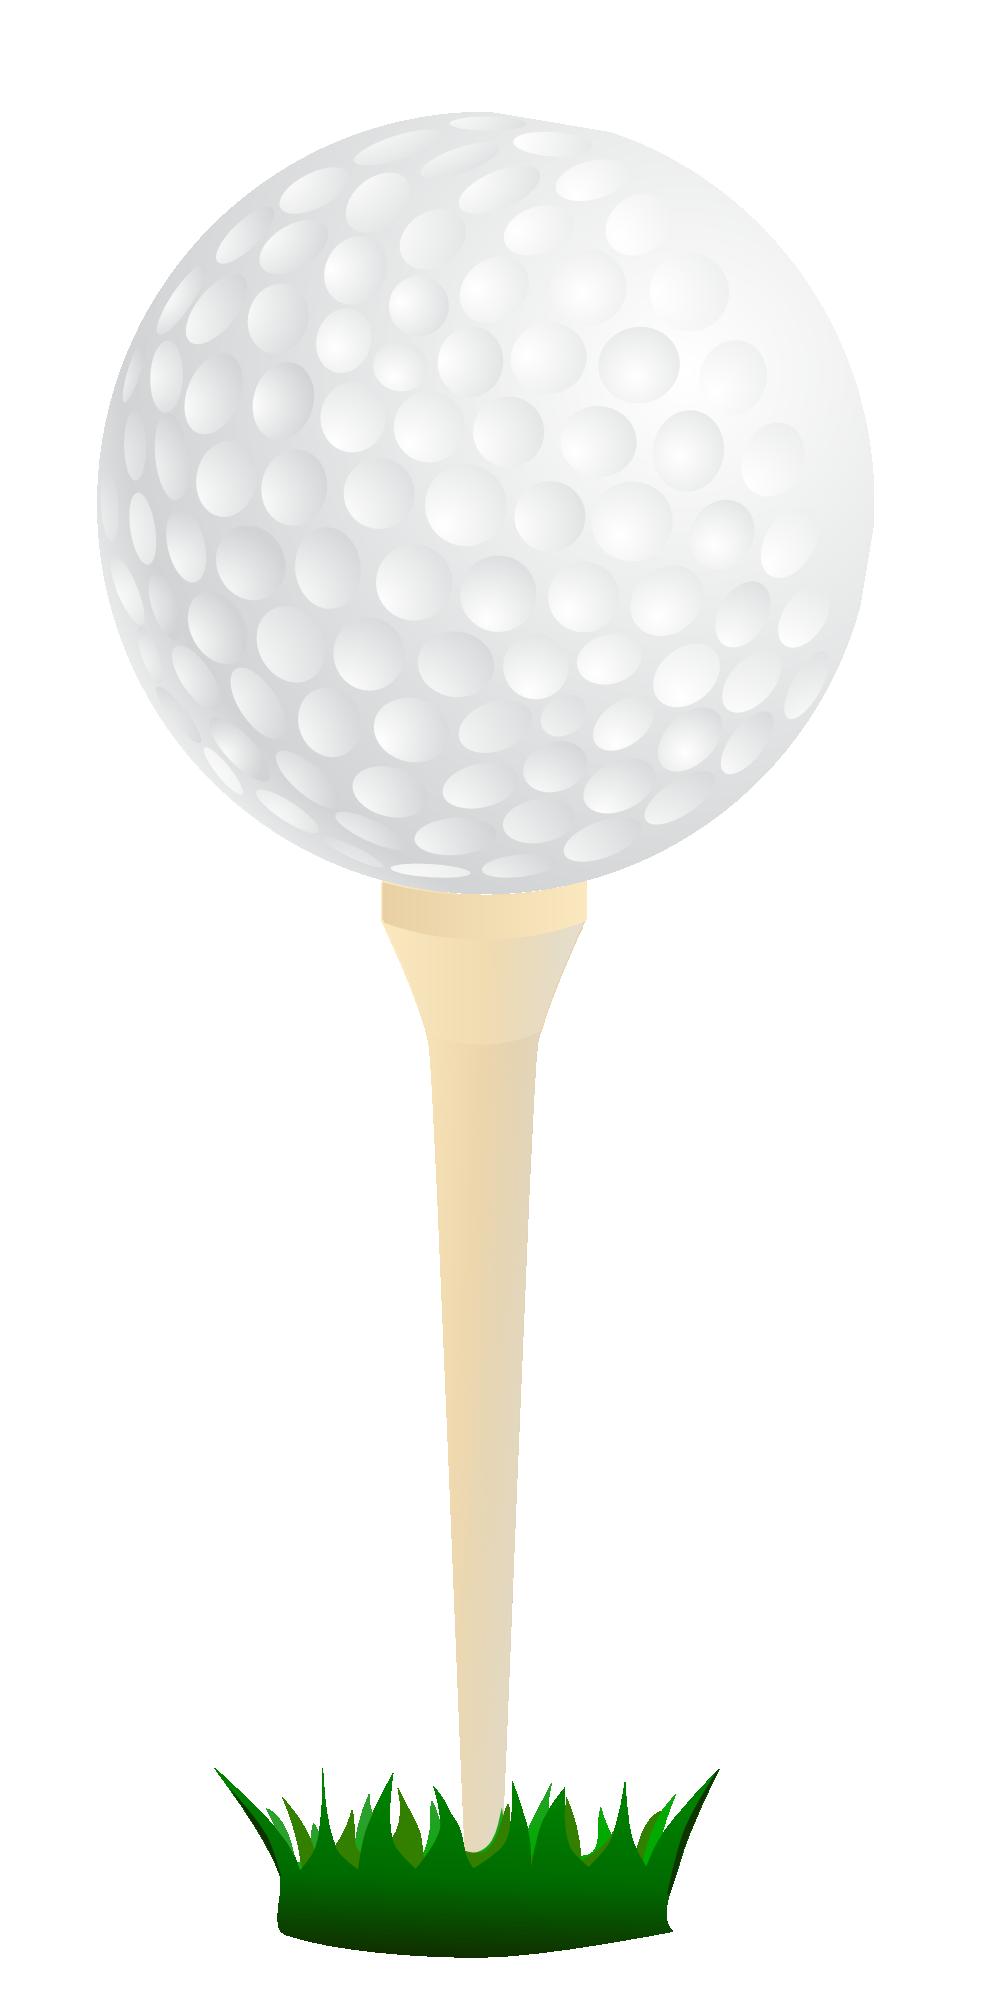 Golf Ball Clip Art Png | Clipart Panda - Free Clipart Images Golf Ball On Tee Clipart